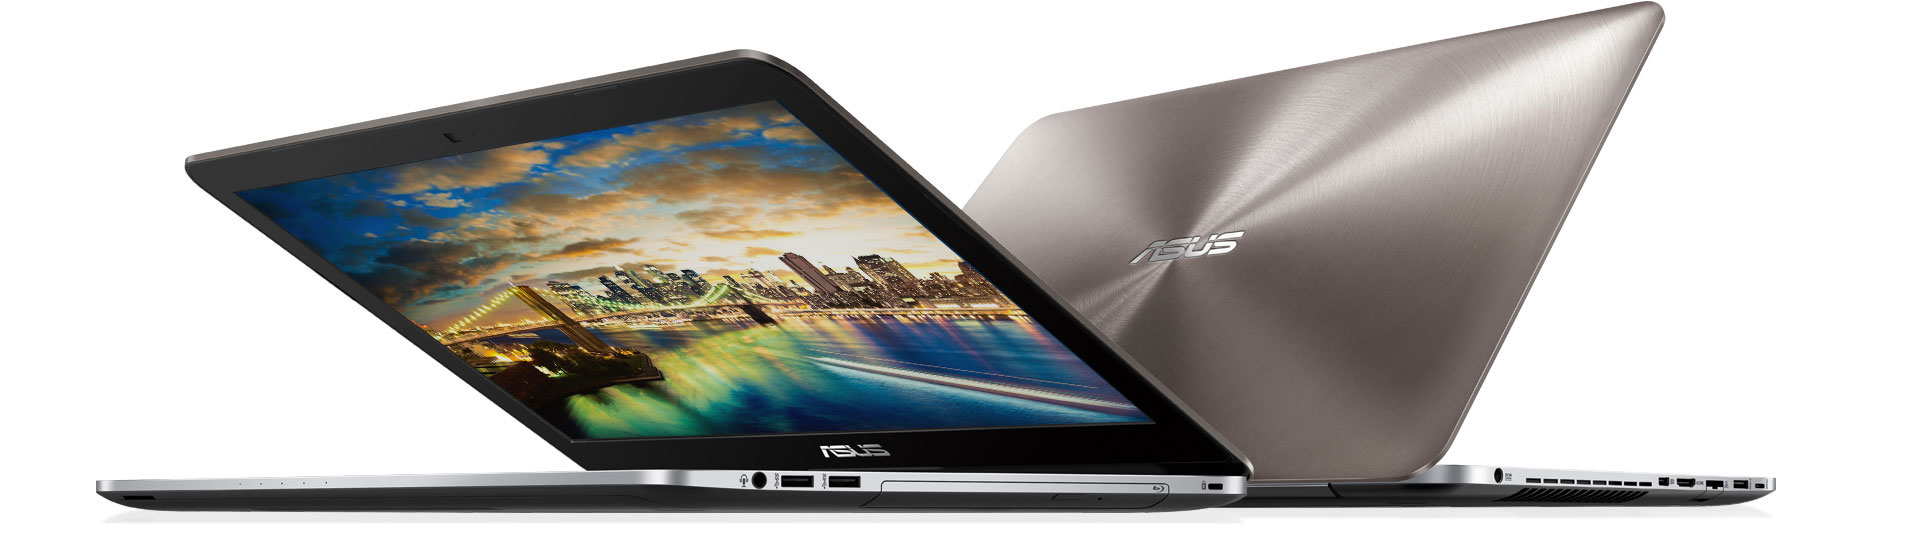 ASUS VivoBook Pro N552VX Intel Bluetooth Driver for Windows 10